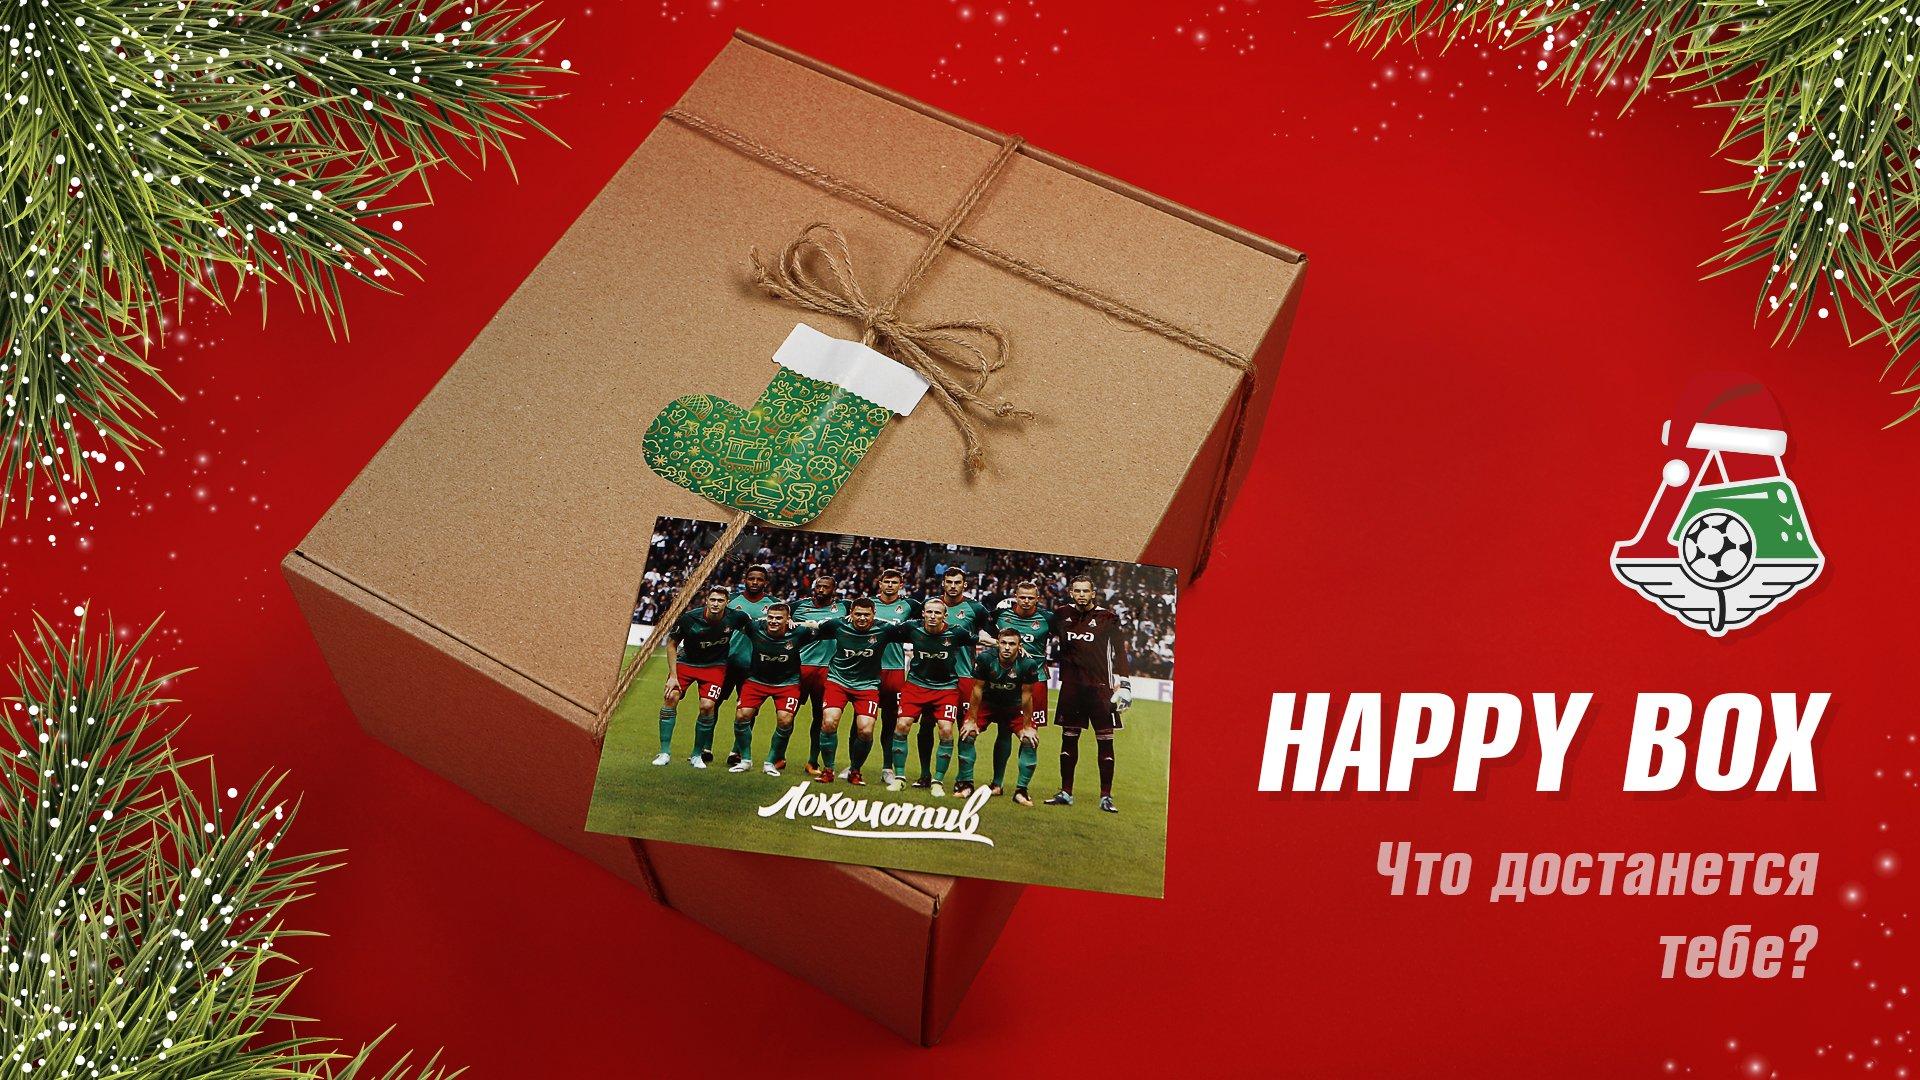 HAPPY BOX: успей купить!